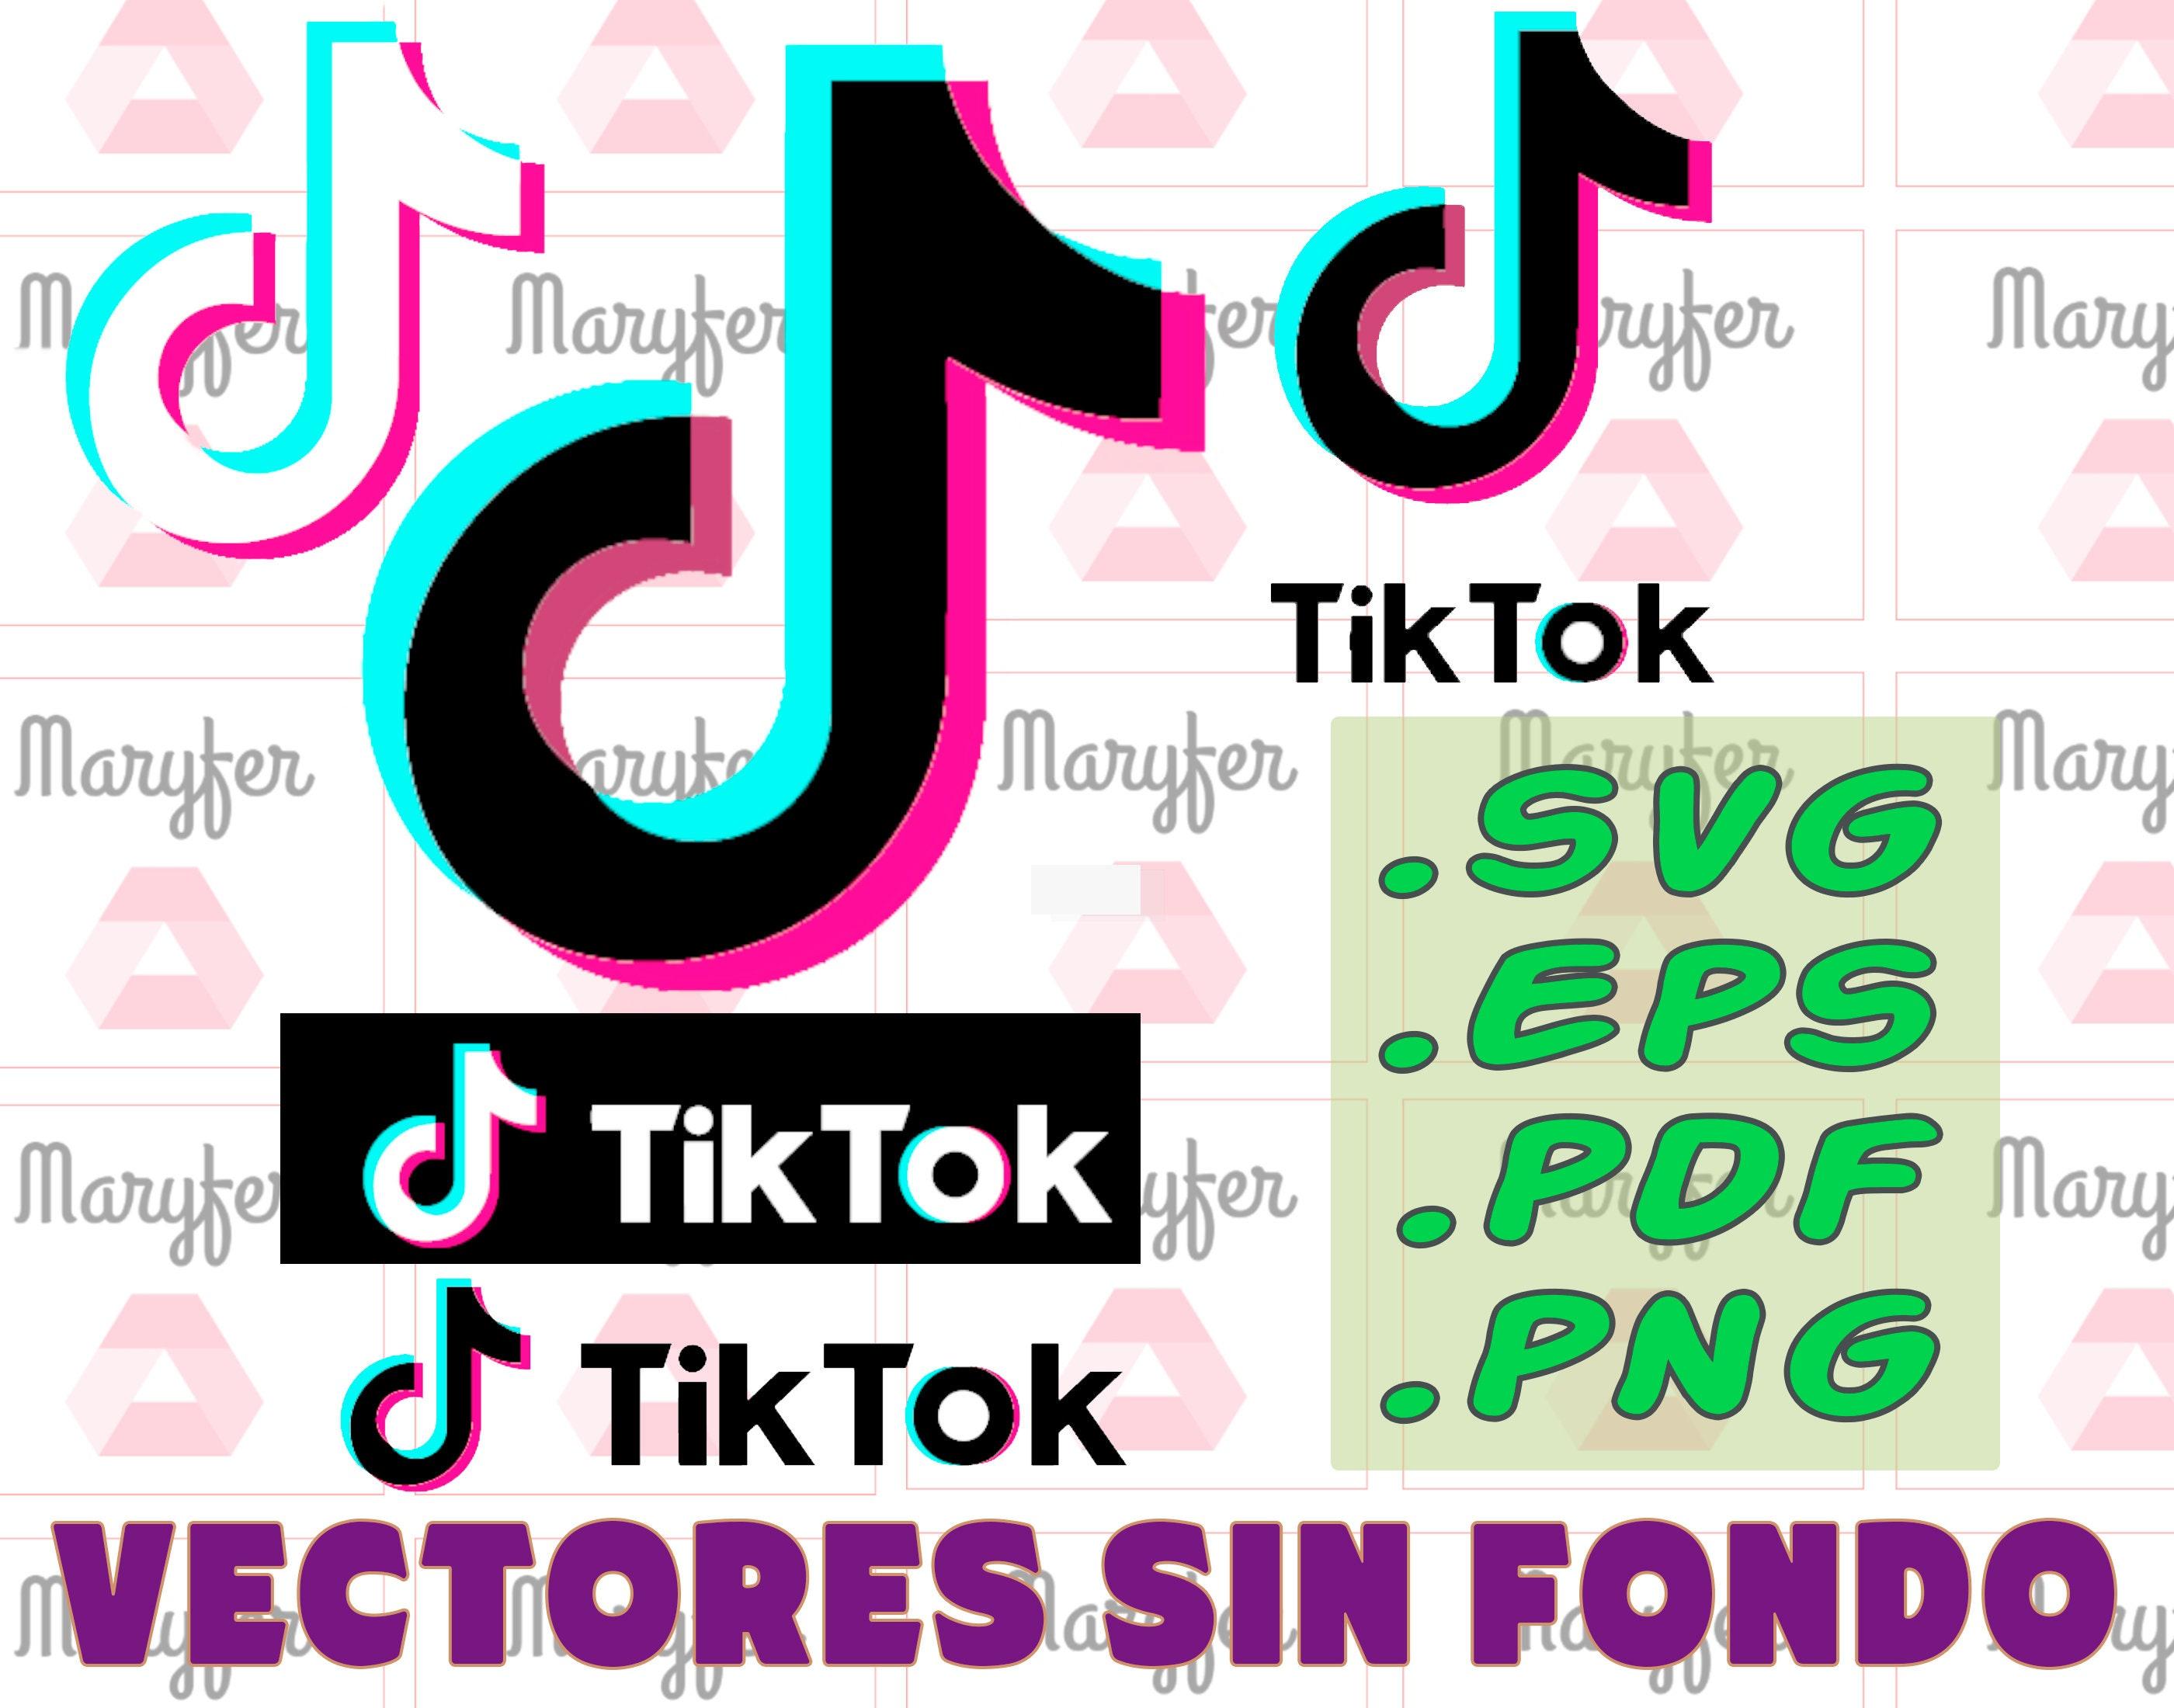 Tiktok Tik Tok Logo Pack Pack Pack Vectors Pdf Eps Svg Png Etsy